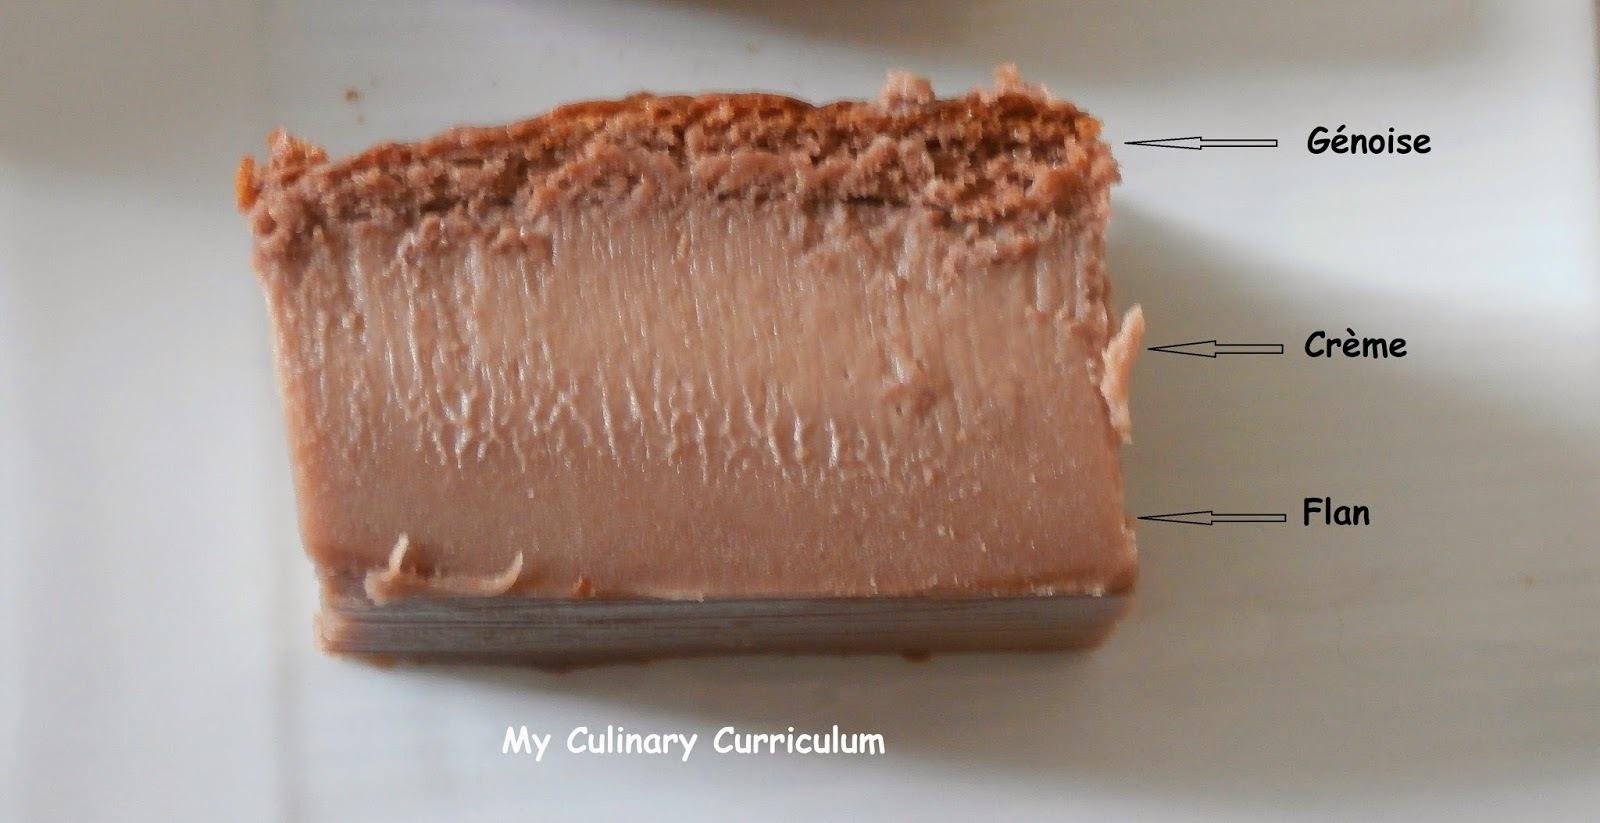 Gâteau magique au Nutella (Nutella magic cake)